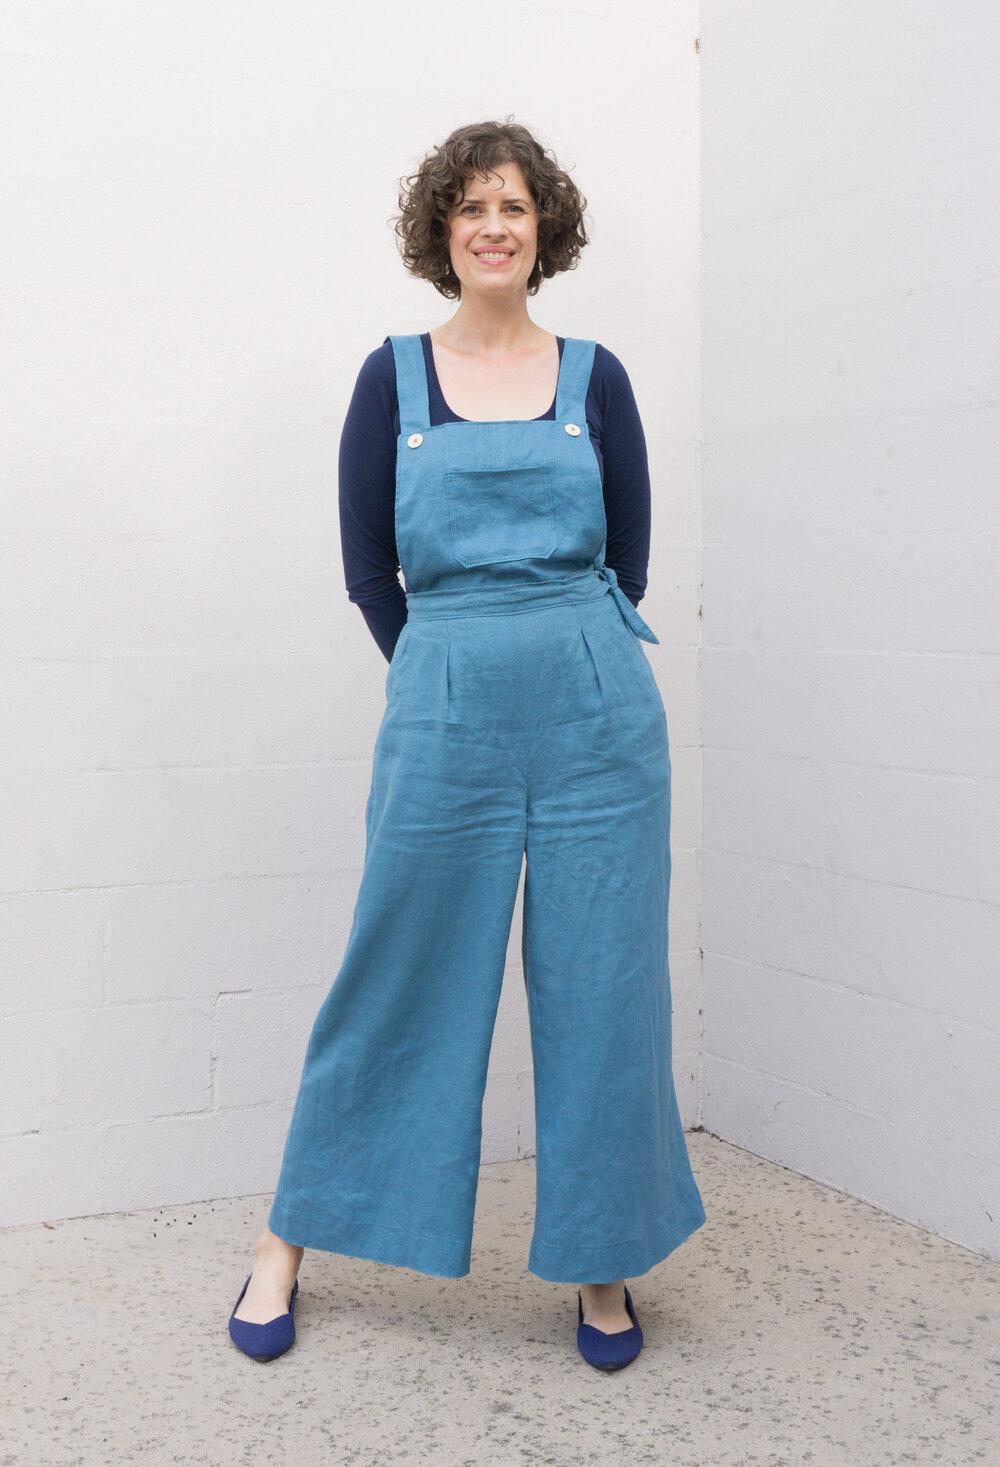 Flint Pants with Bib in blue-green teal linen by Sew DIY